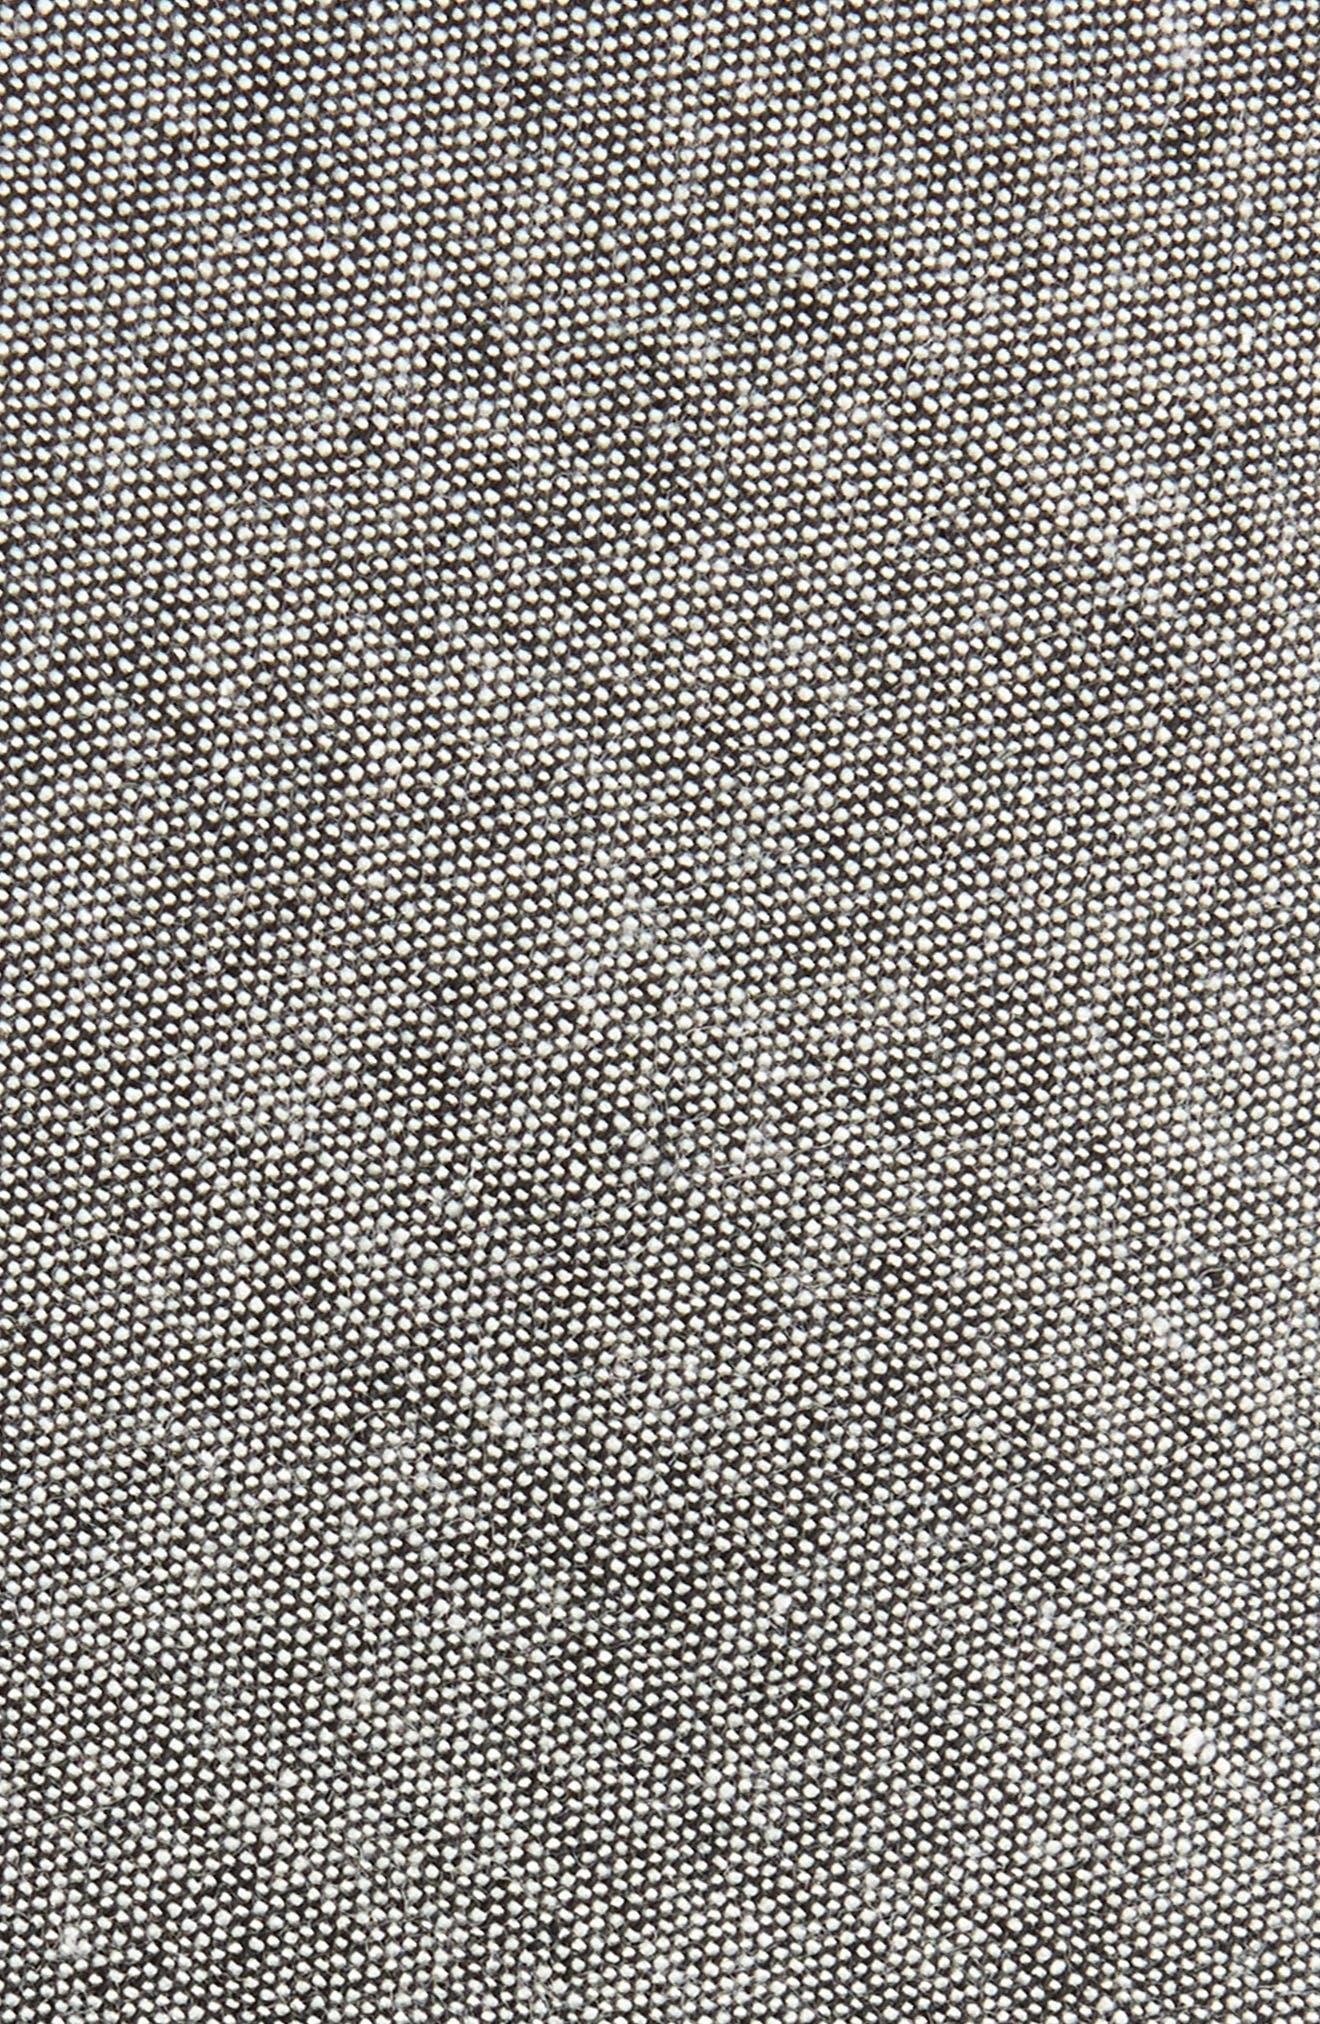 Alternate Image 2  - Nordstrom Men's Shop Textured Skinny Tie